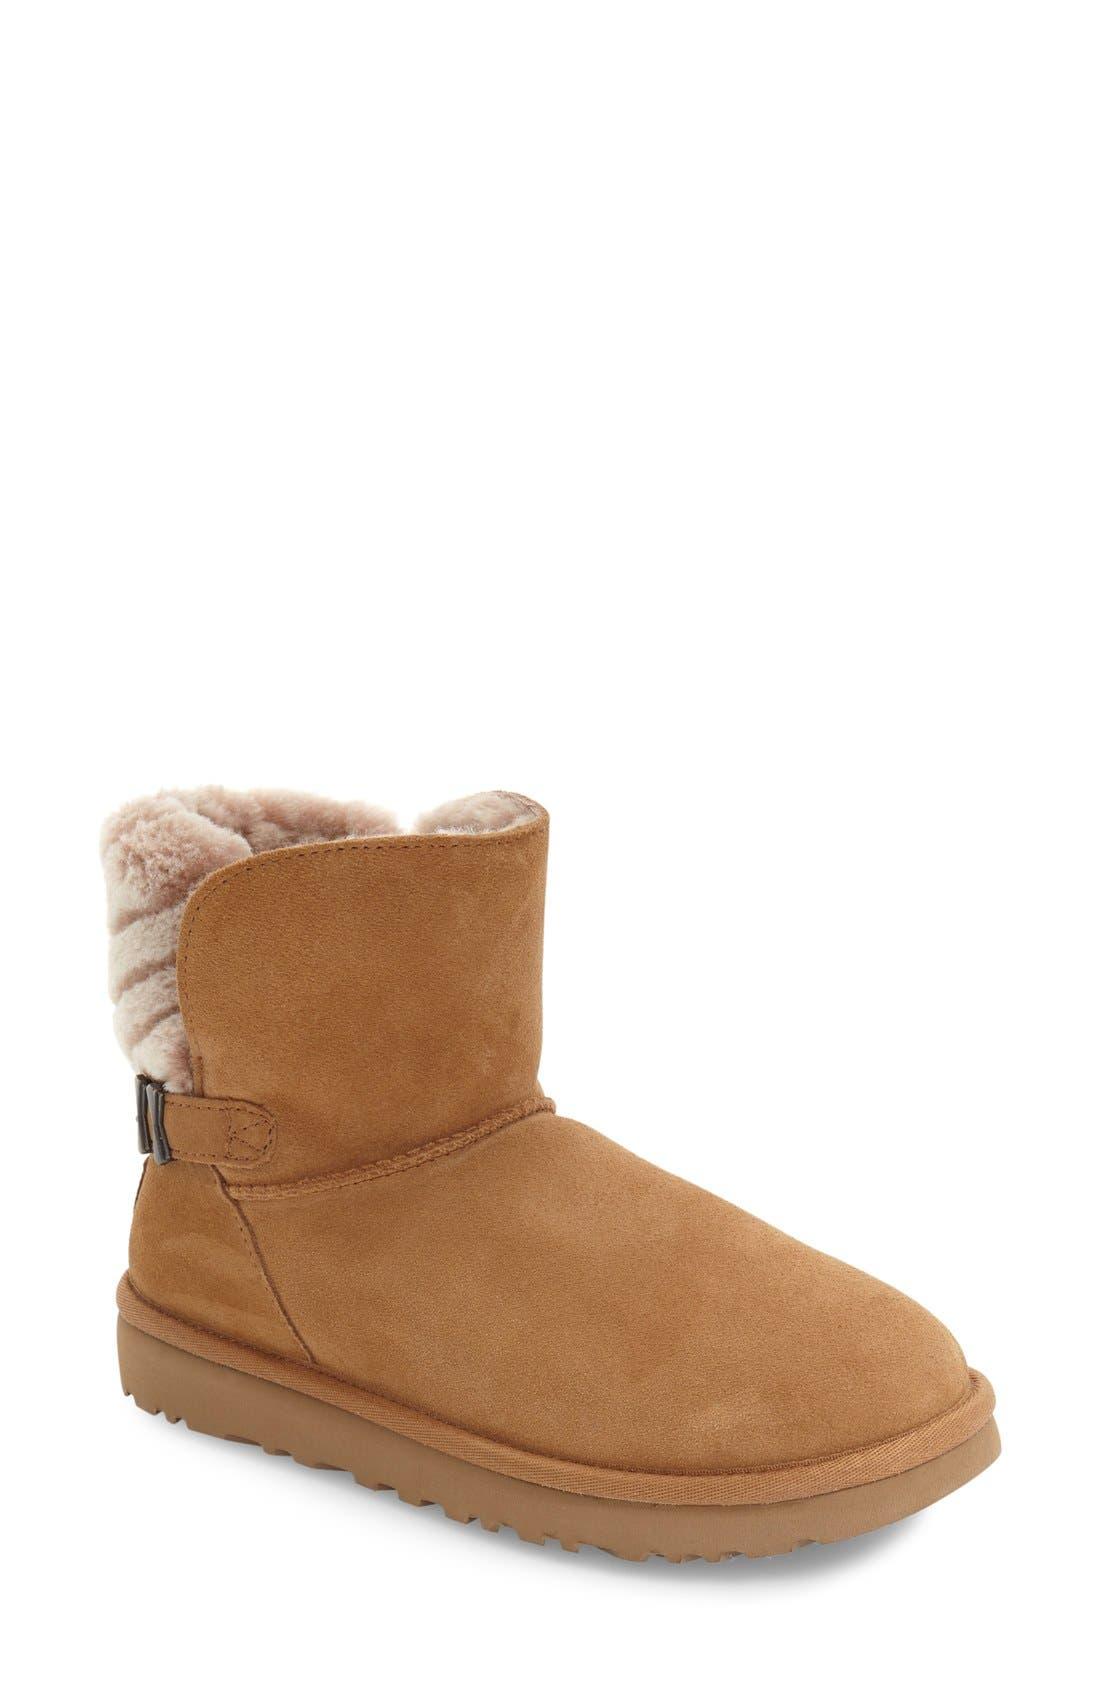 Alternate Image 1 Selected - UGG 'Adria' Boot (Women)